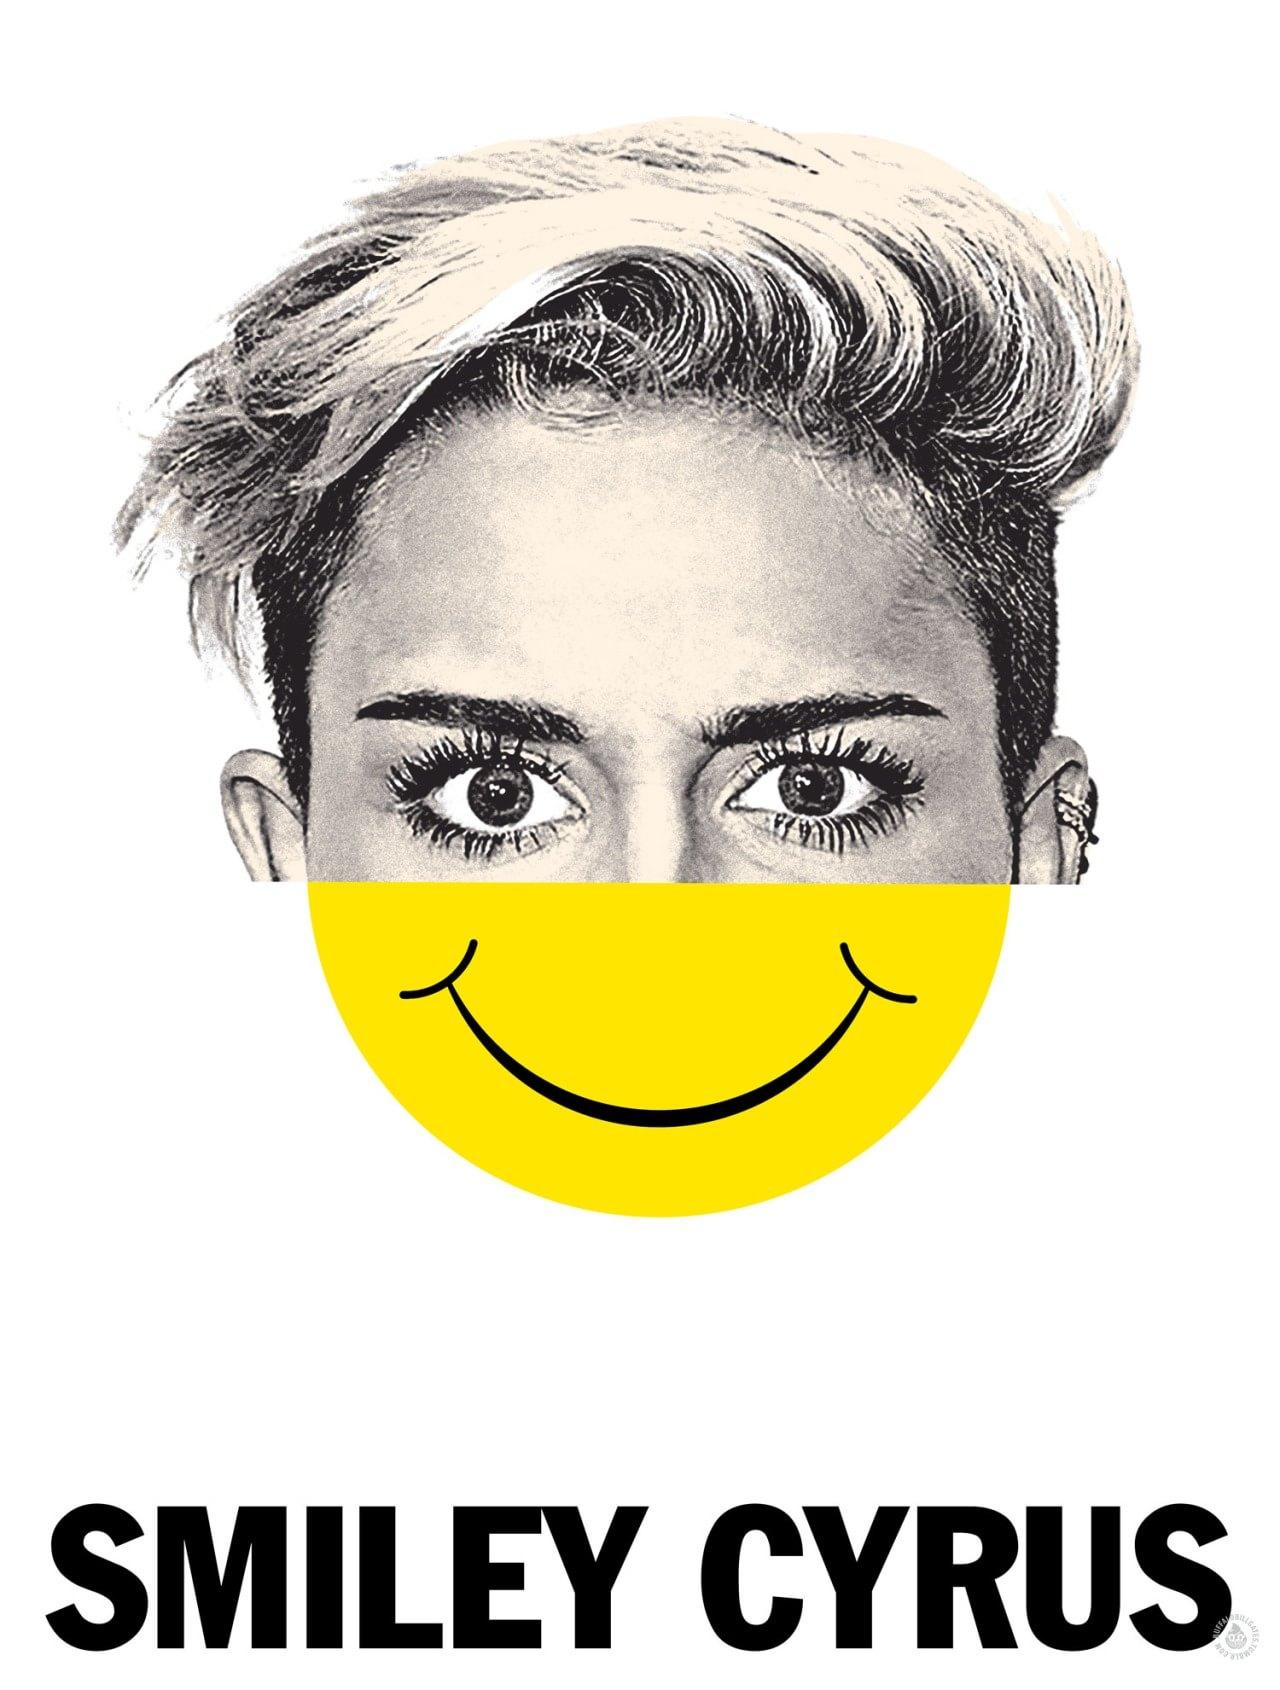 Smiley-cyrus-min